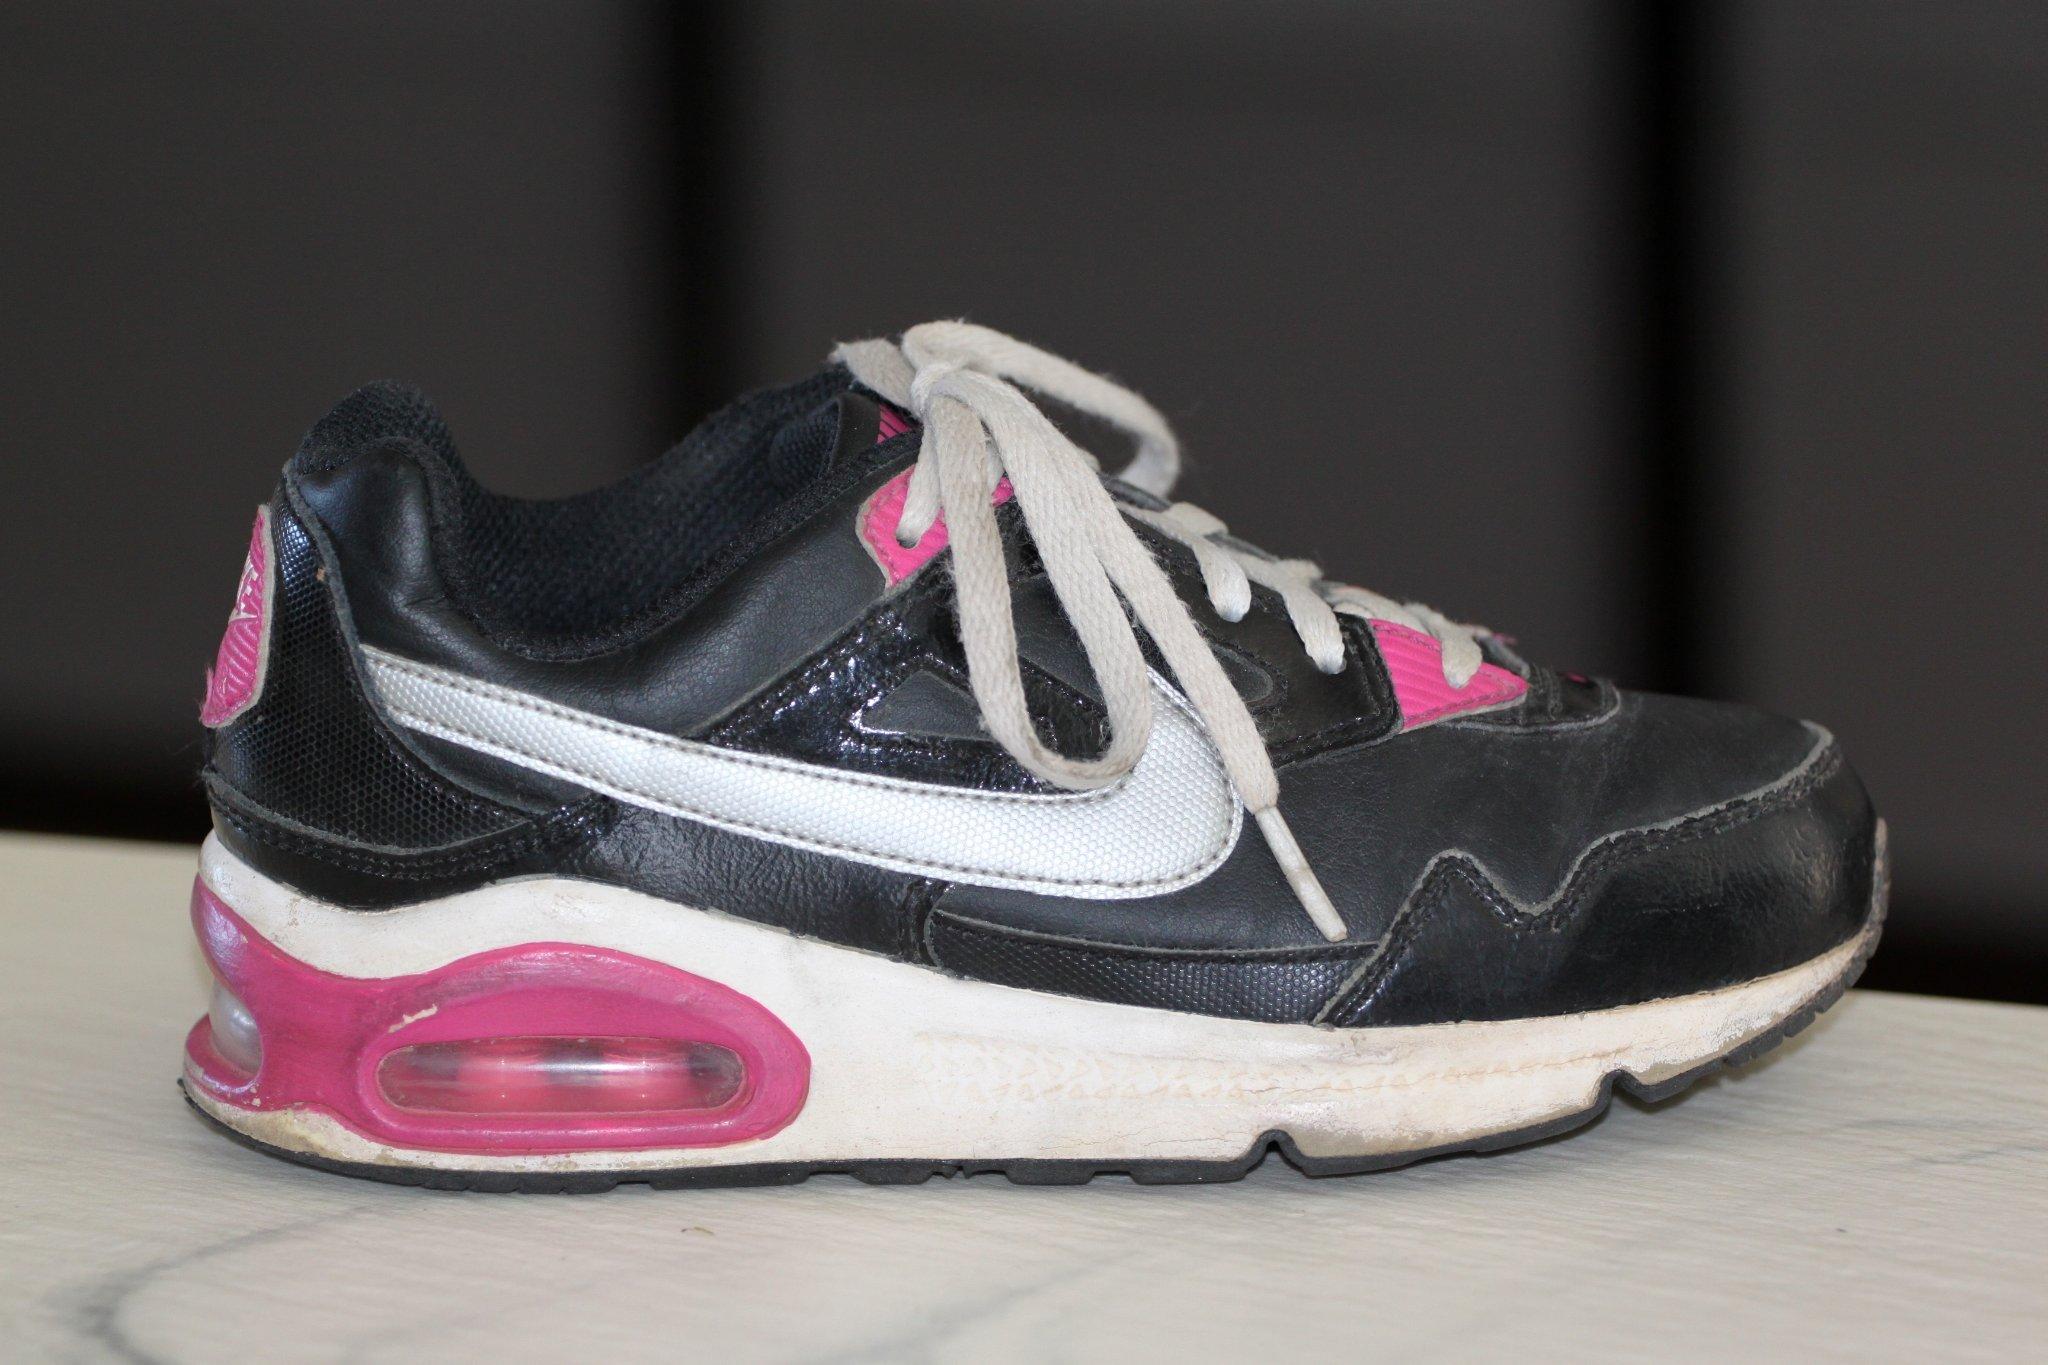 plus de photos 3b808 39b76 Nike air max i str 31,5 innermått 19,5 cm (348576500) ᐈ Köp ...